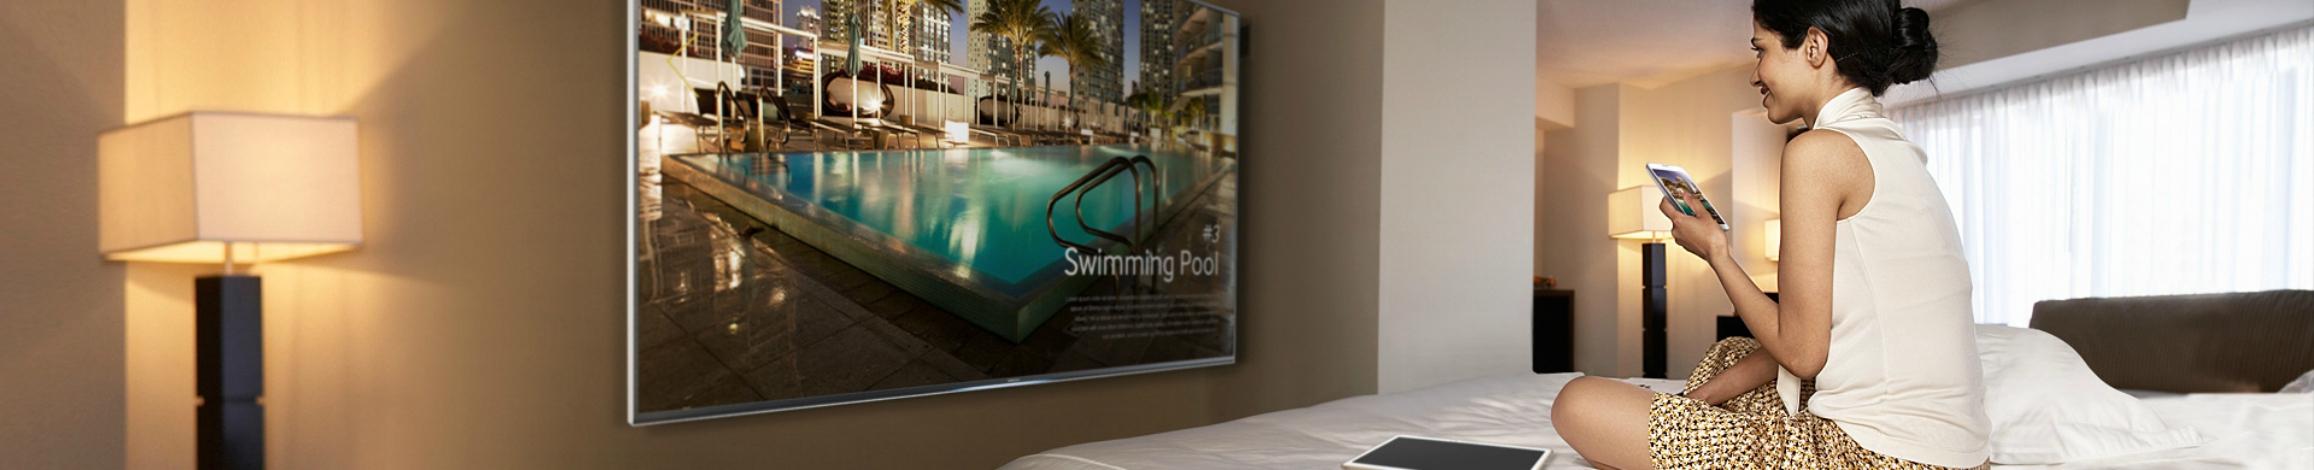 Furnizeaza continut interactiv clientilor  utilizand solutiile Hotel TV